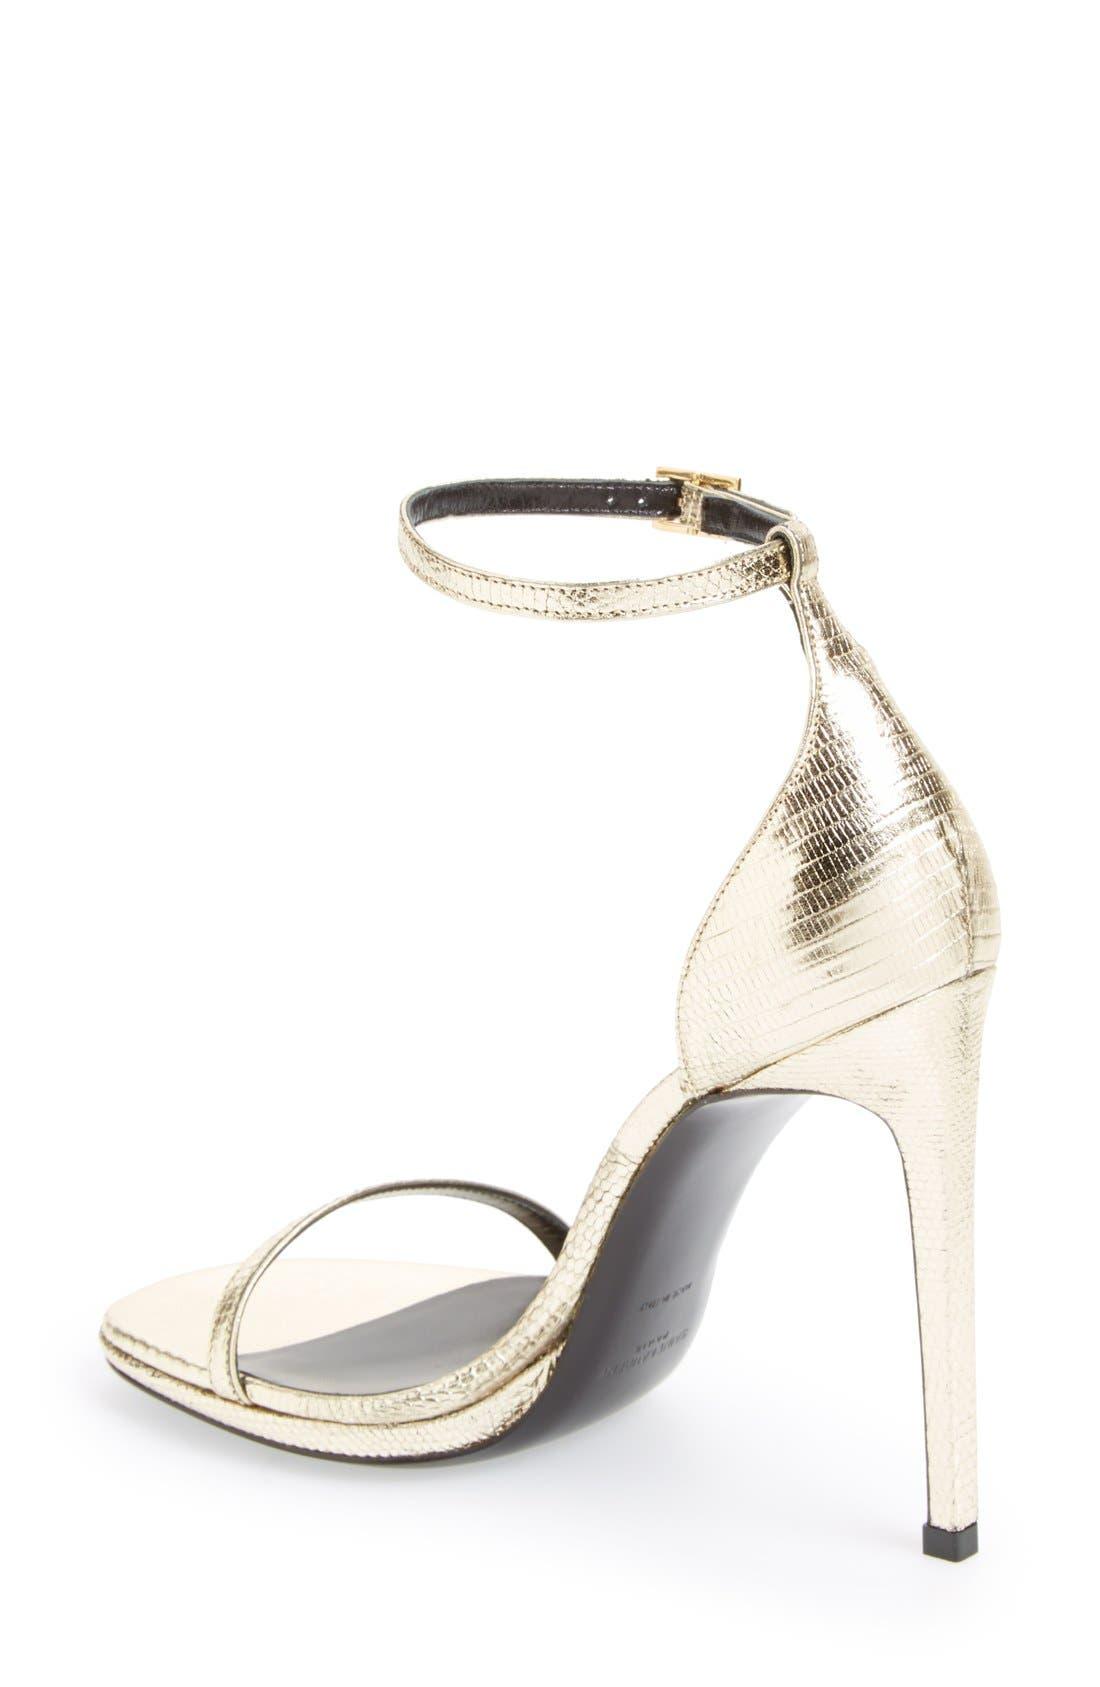 Alternate Image 2  - Saint Laurent 'Jane' Metallic Lizard Embossed Ankle Strap Sandal (Women)